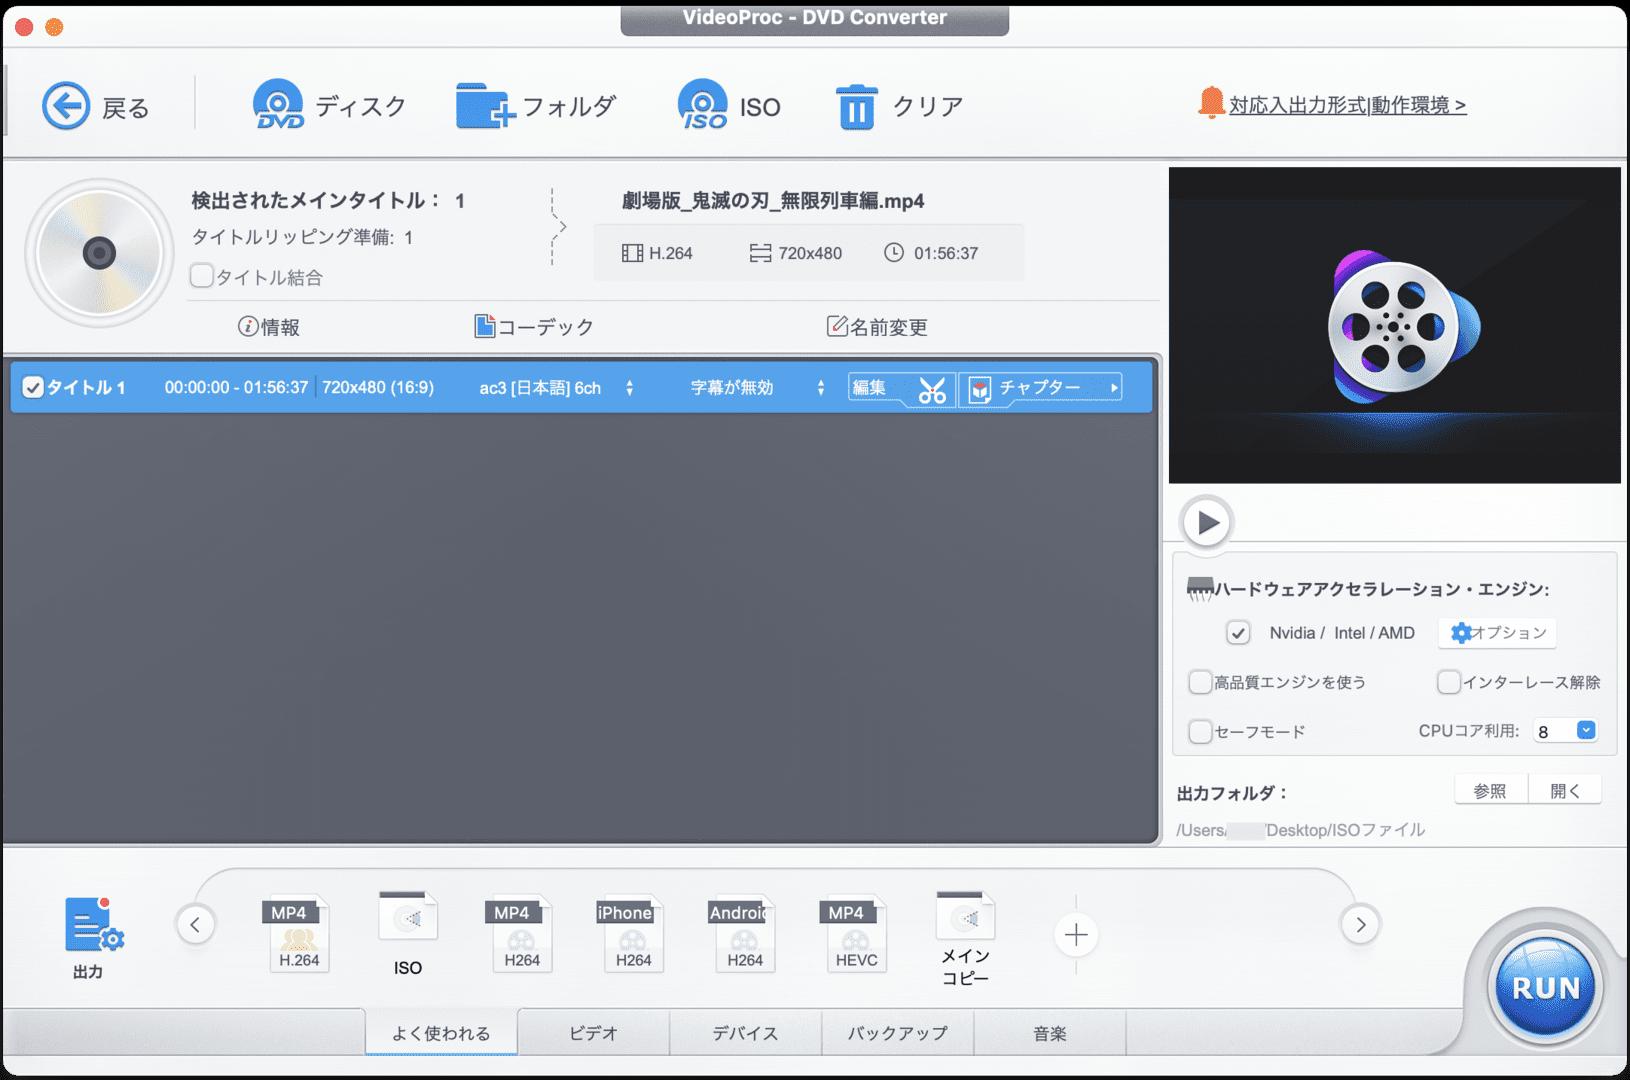 【DVDコピー方法Mac版】MacでレンタルDVDをリッピングしてパソコンに取り込む方法|Macはシュリンク非対応なのでVideoProcで一発コピー!|DVDをコピーする:DVDを読み込む:DVDの読み込みが完了すると、DVDの情報が一覧表示されますよ。